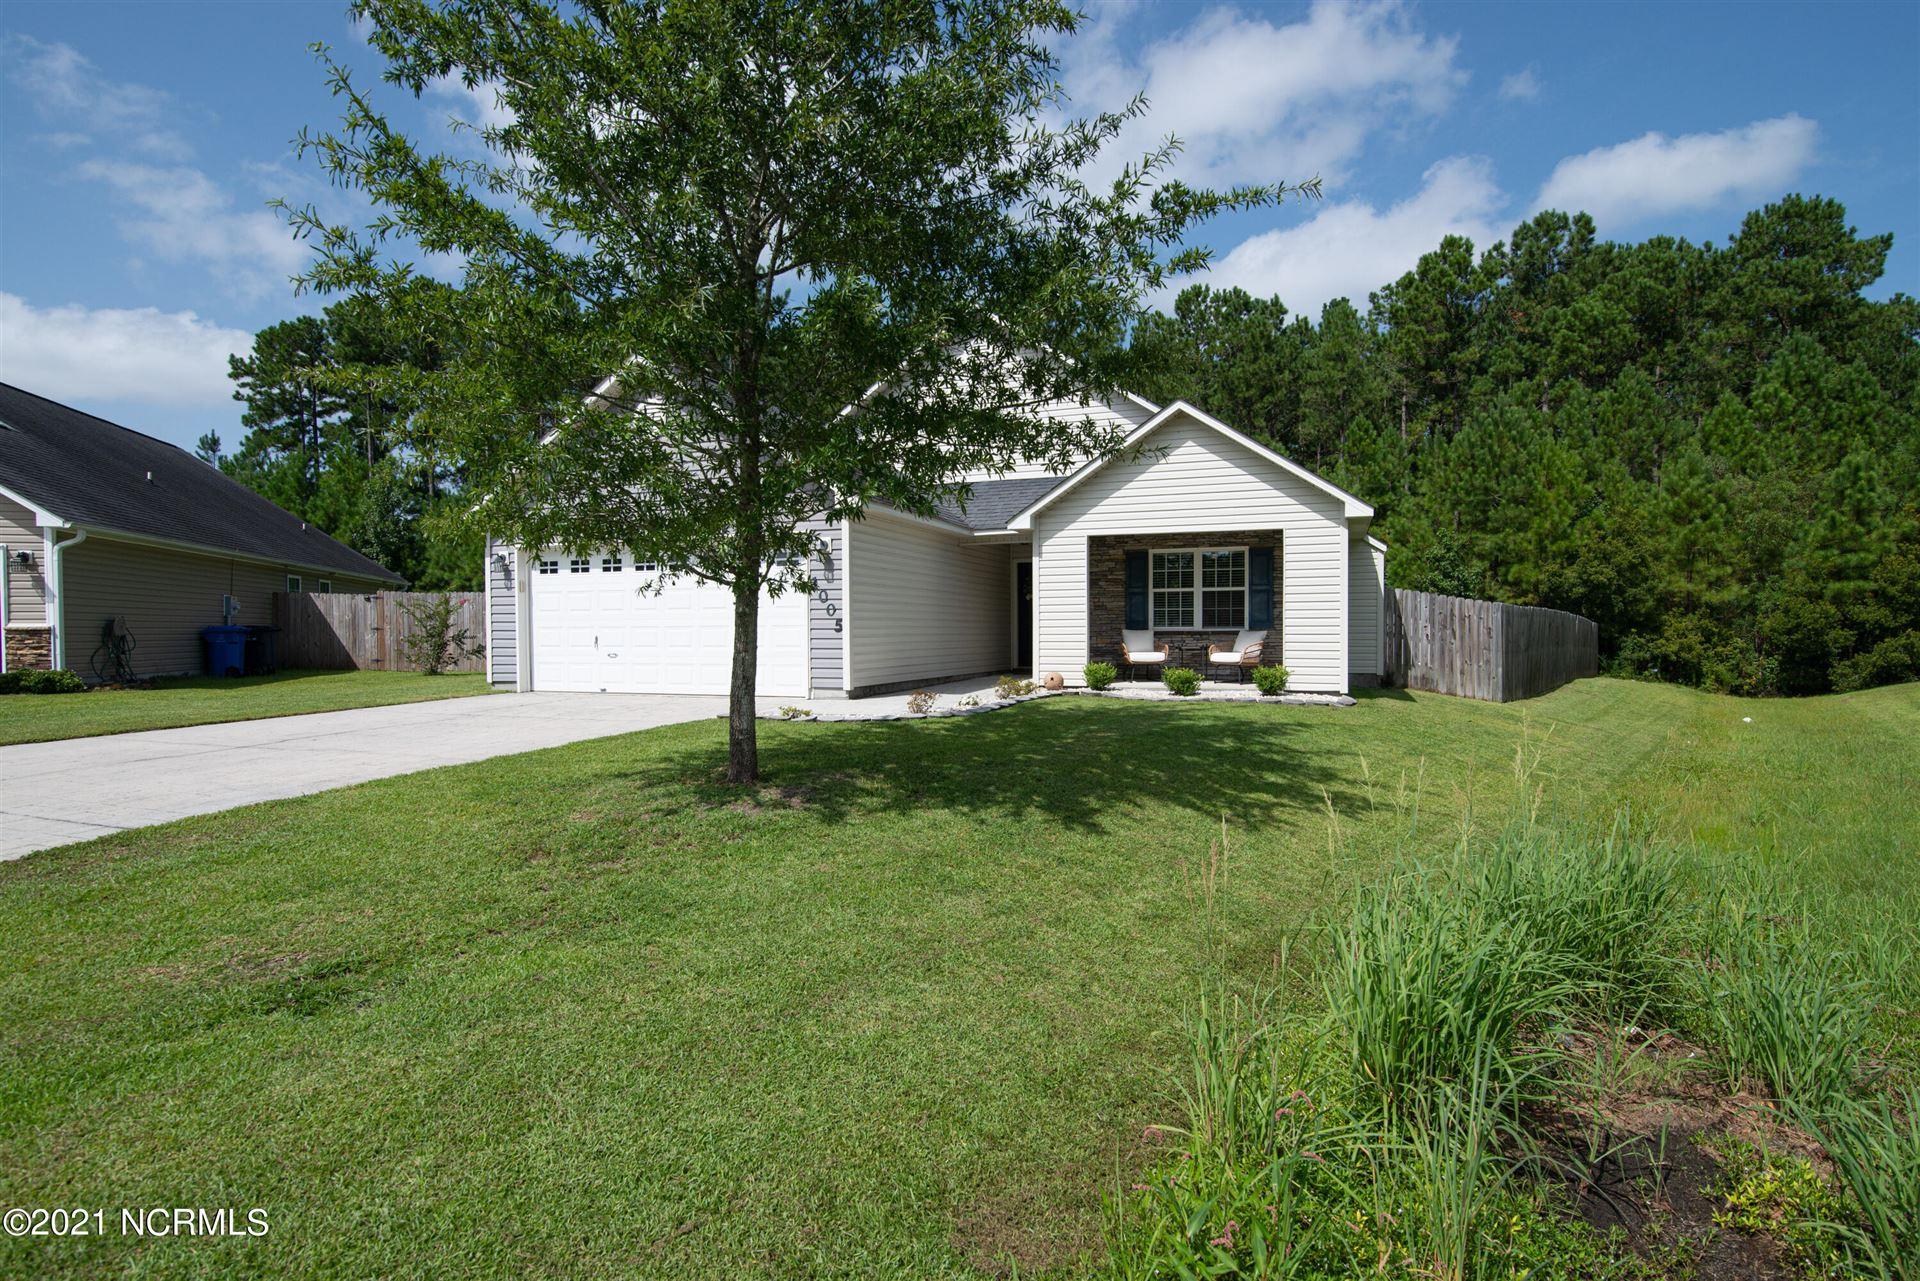 Photo of 1005 Summerfield Court, Jacksonville, NC 28546 (MLS # 100288923)